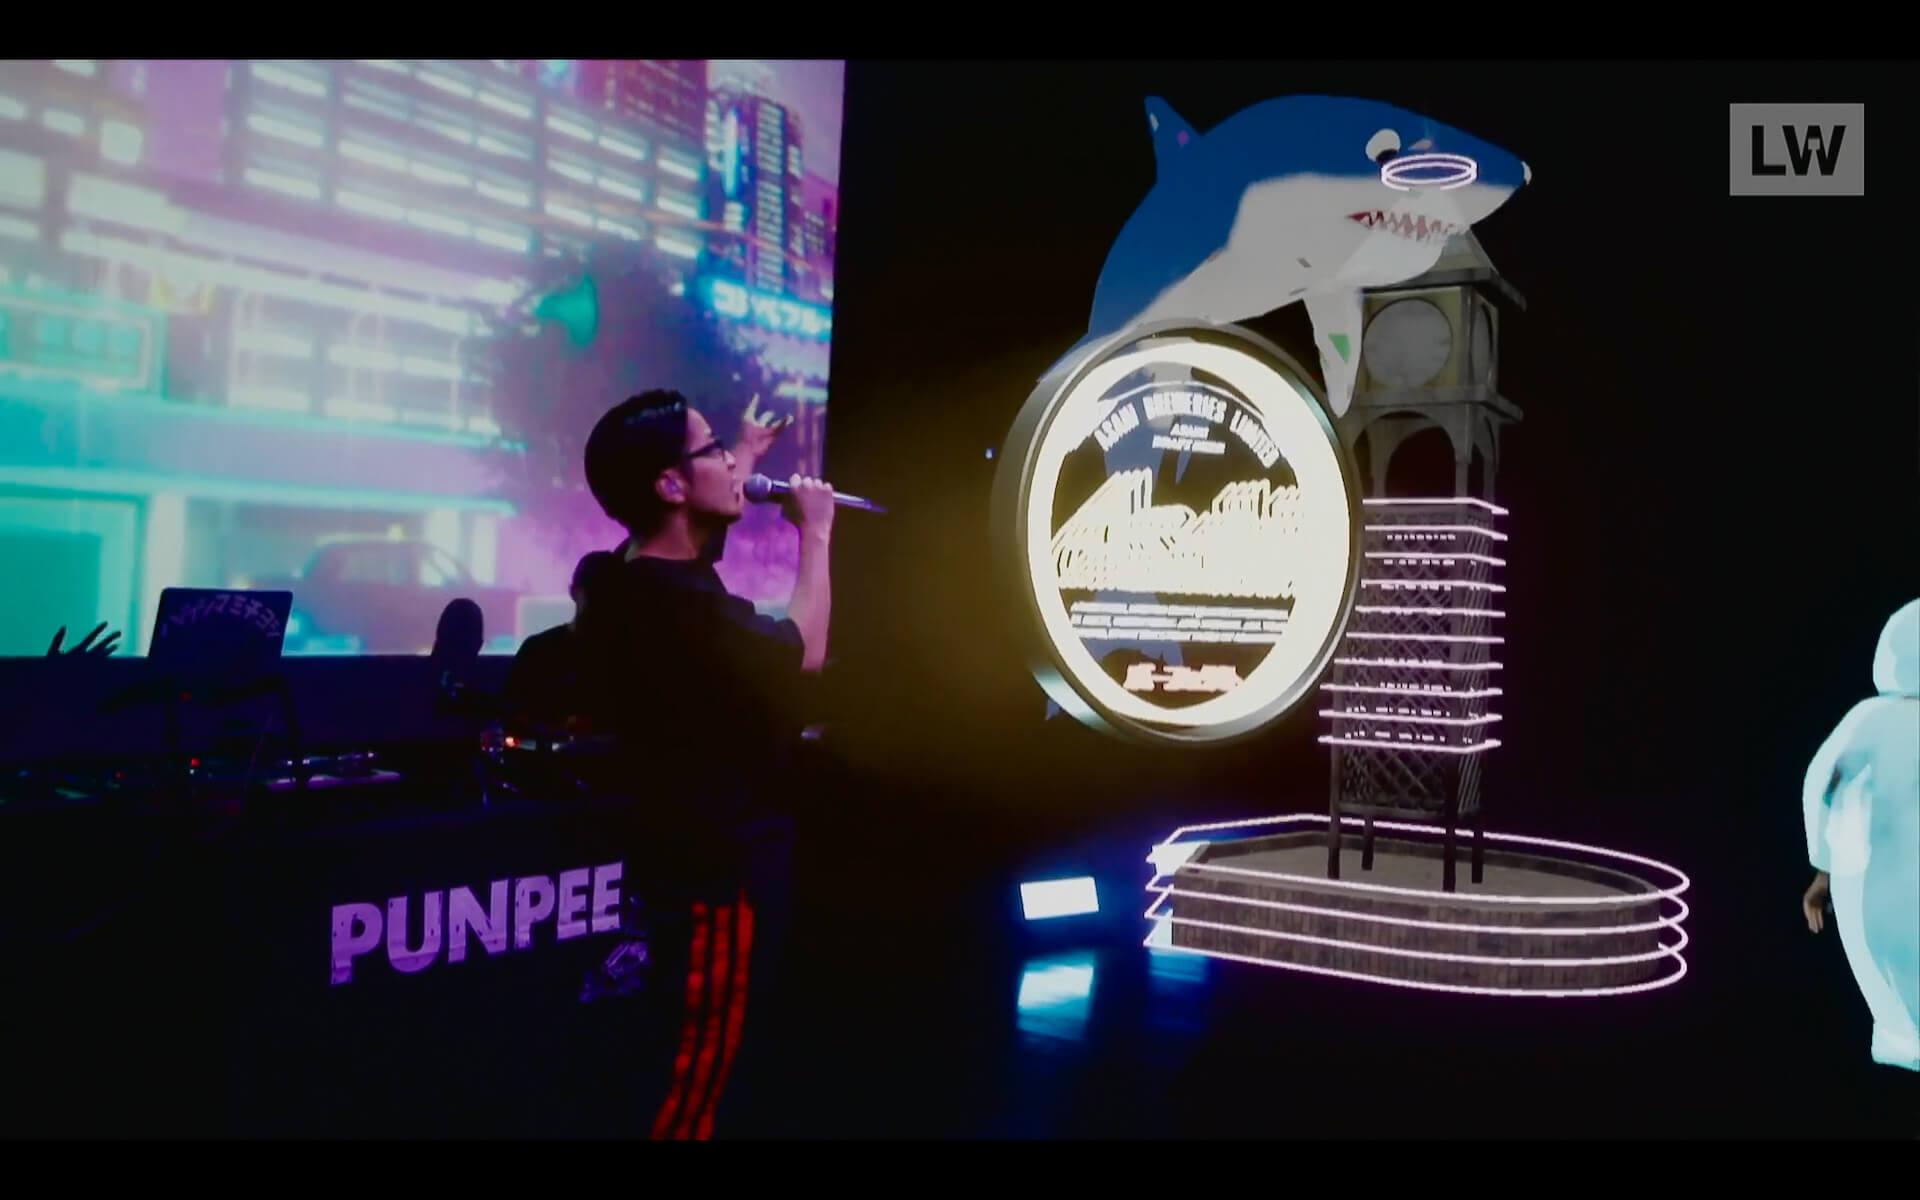 LIVEWIRE PUNPEE<Sofa Kingdomcome>のイースターエッグを一挙紹介! by みやーんZZ music200918_punpee_livewire_15